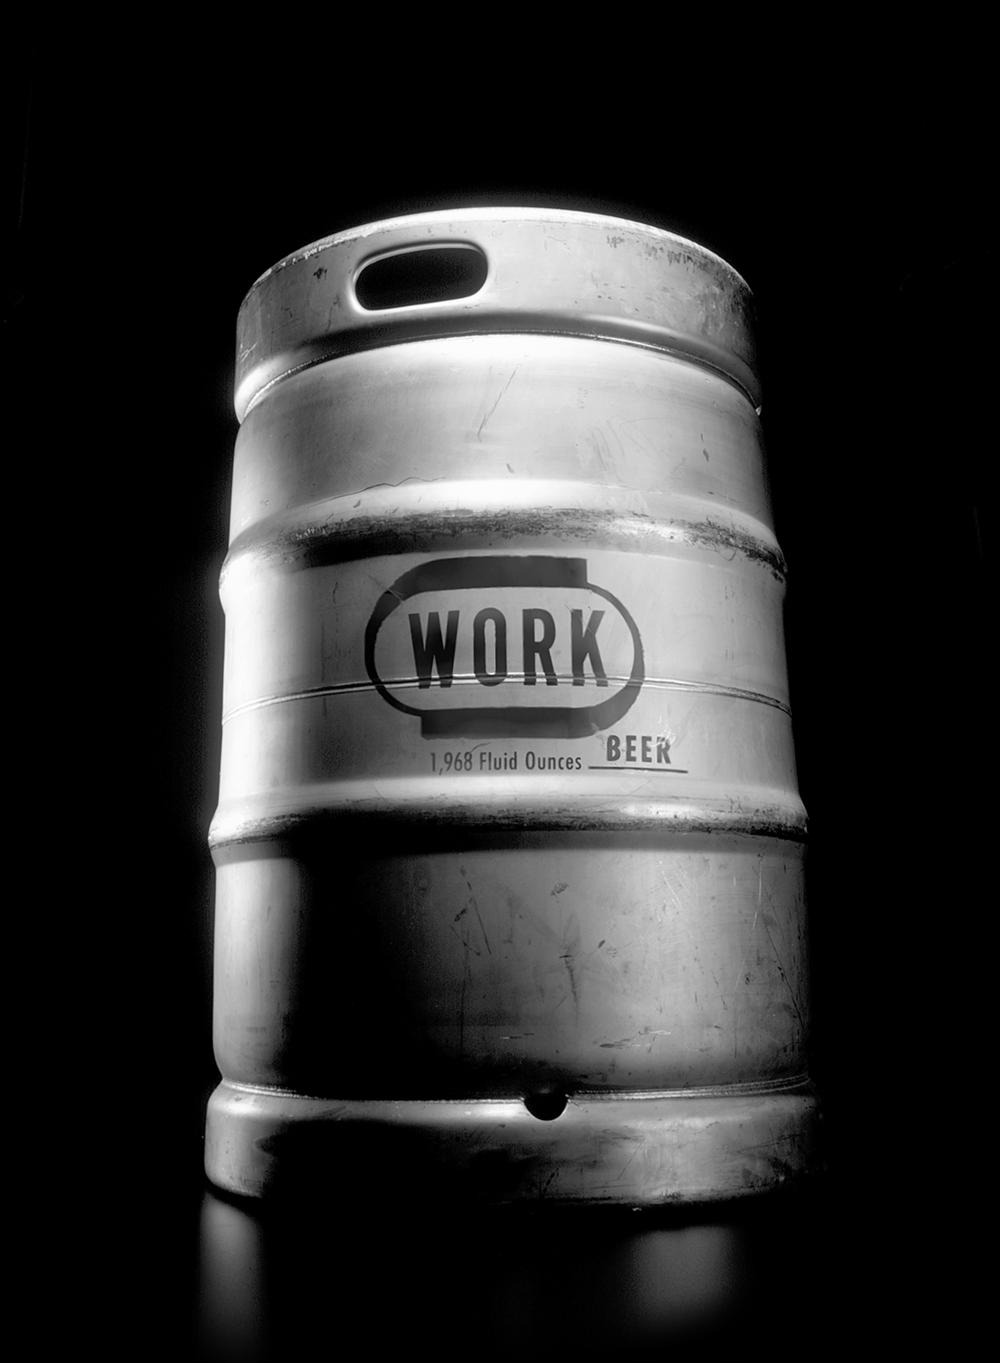 WORK keg.png